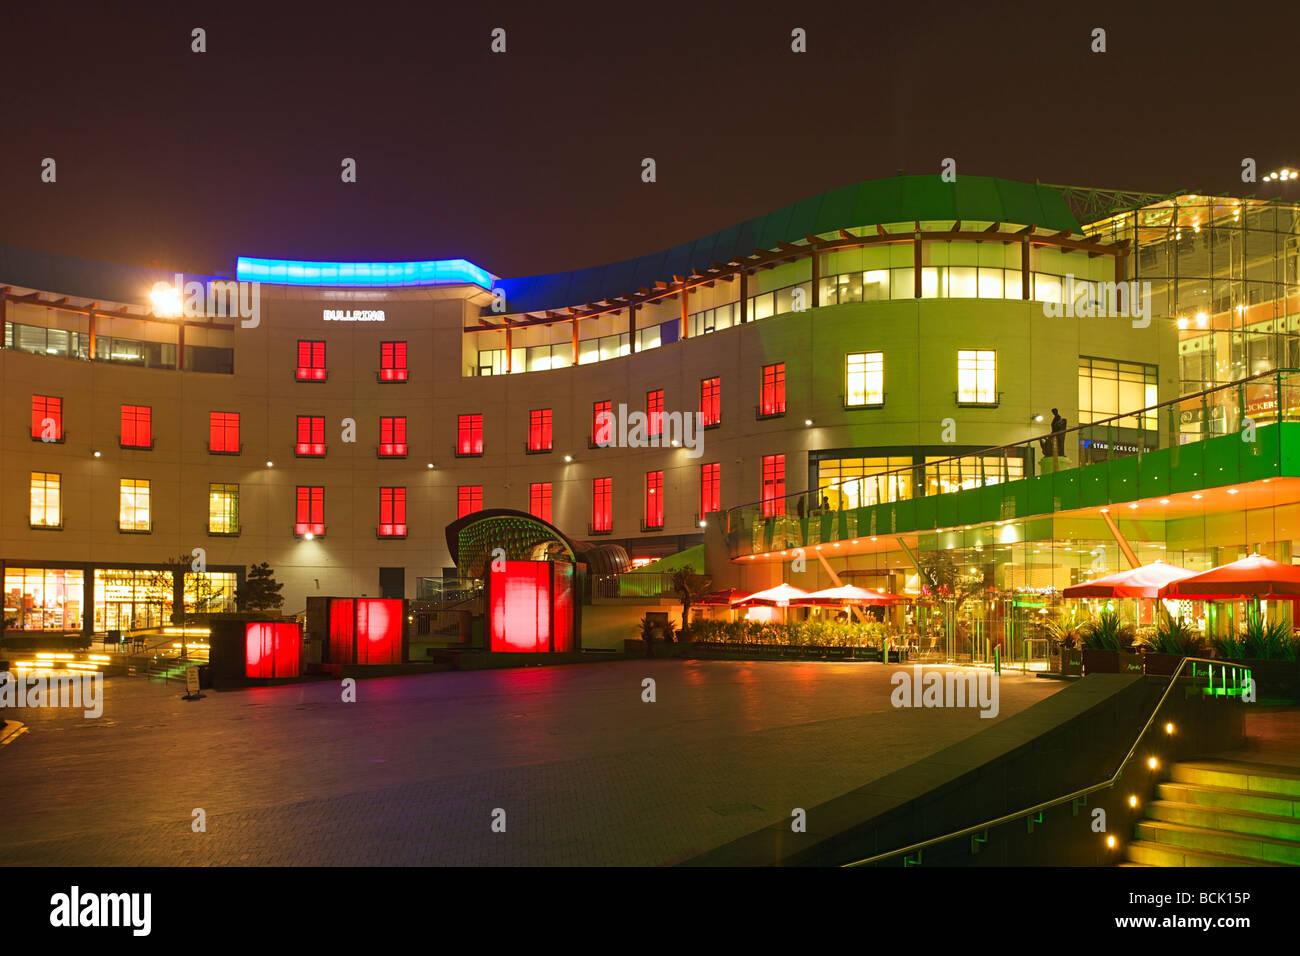 Selfridges, Bullring shopping mall in Birmingham at night, West Midlands of England Stock Photo